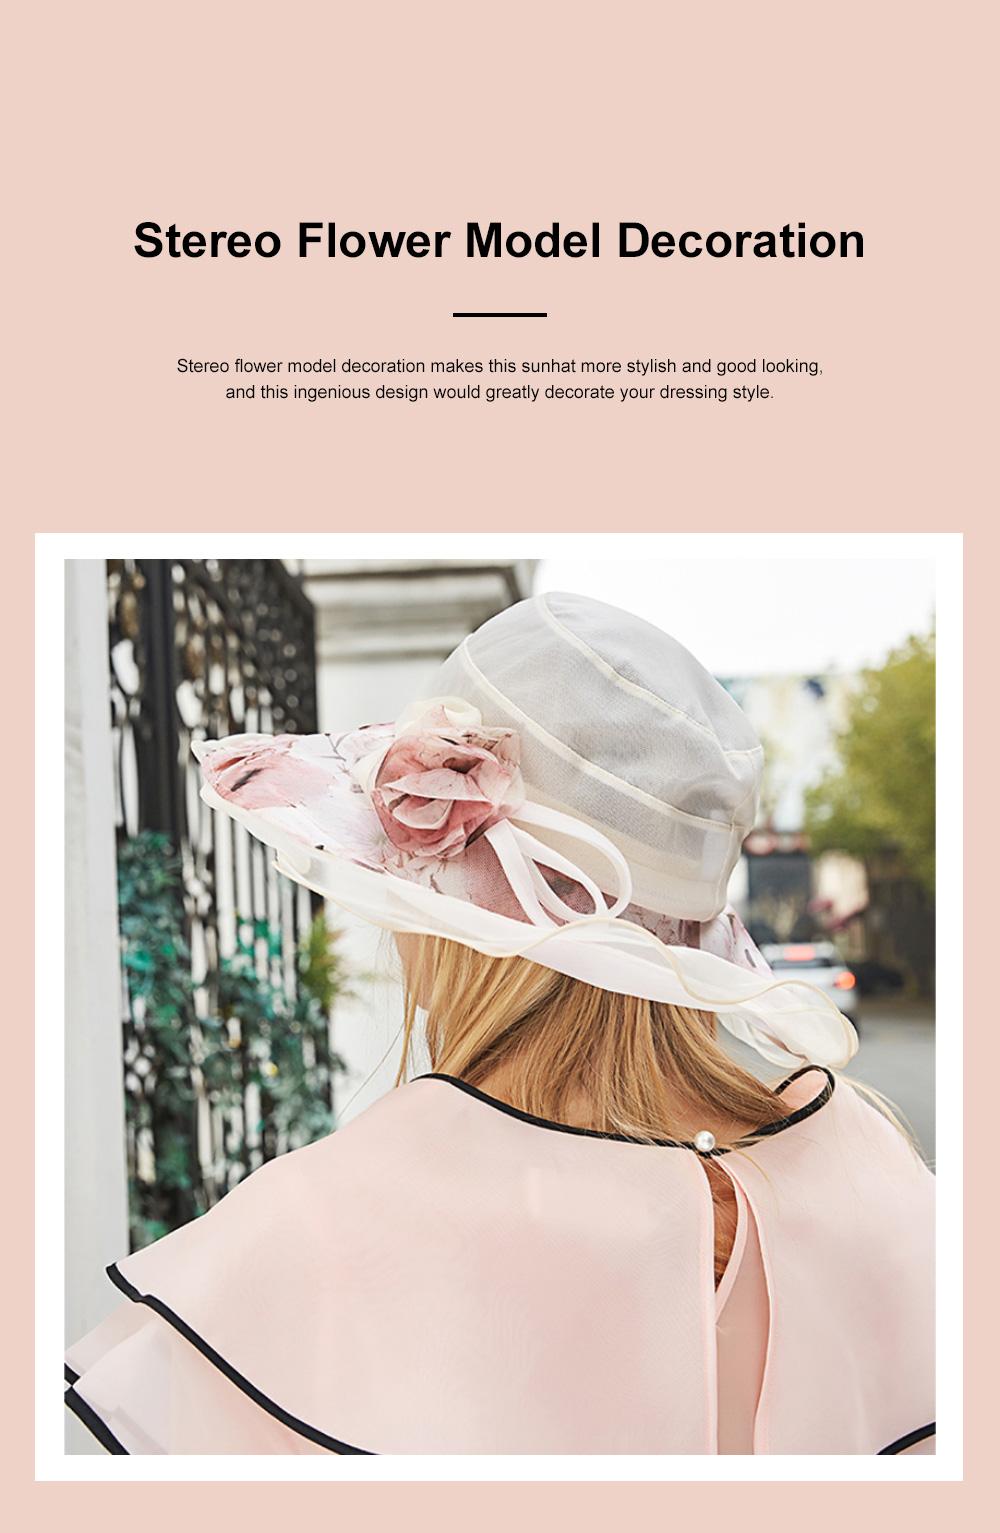 Minimalist Stylish Atmosphere Stereo Flower Model Decorative Foldable Lady Sun Bonnet Hat with Large Brim Wind Rope 4